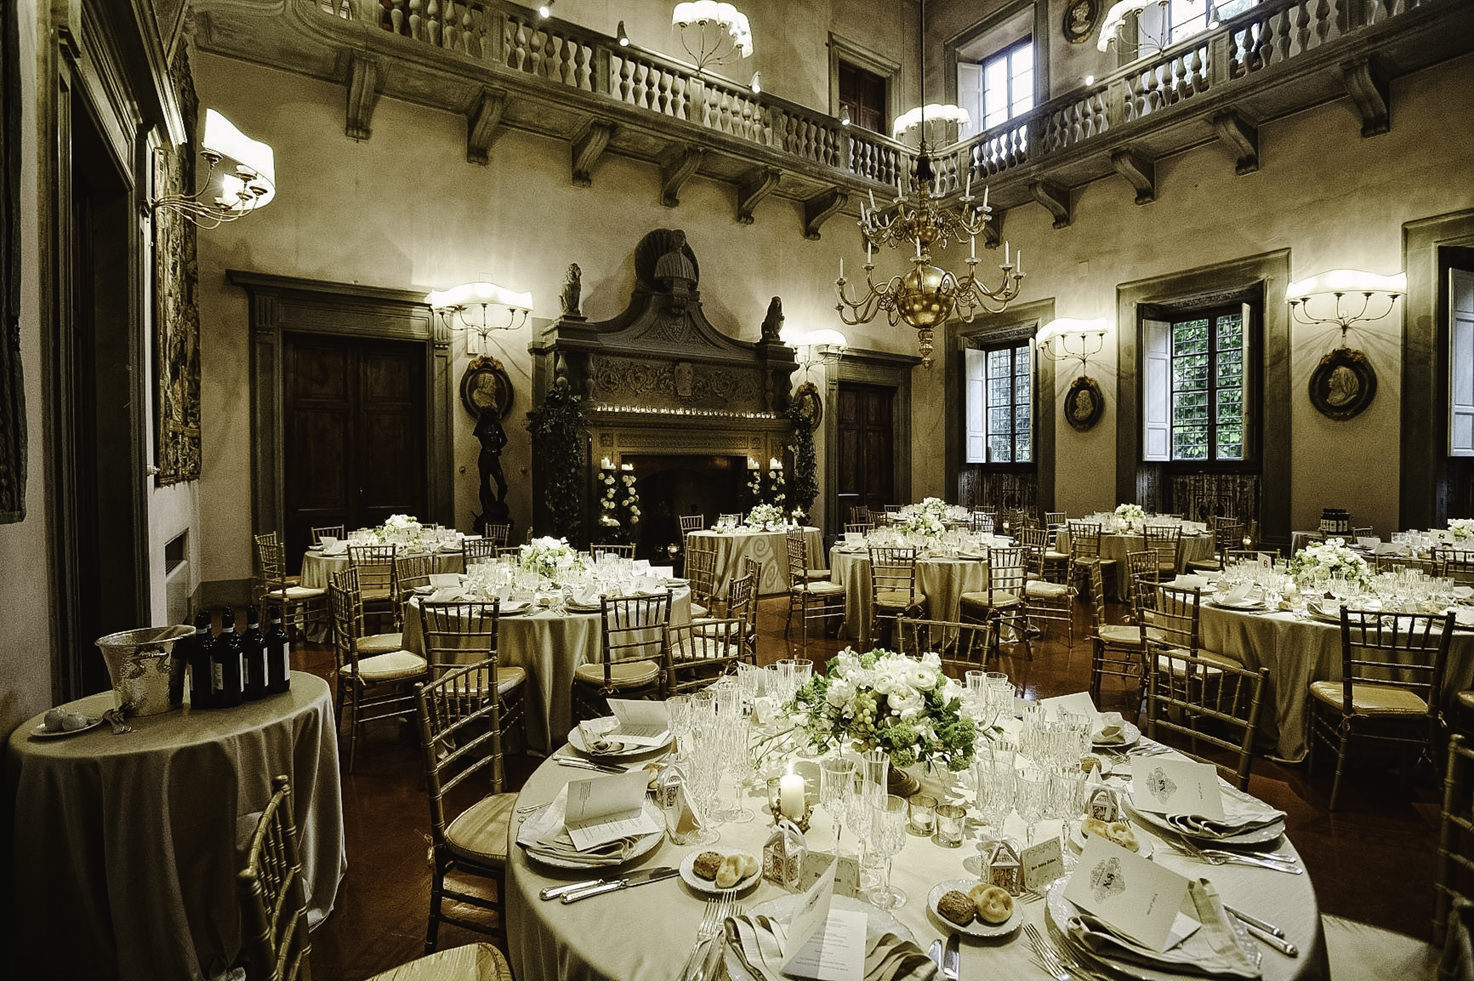 Wedding reception in the tapestry room of Villa di Maiano